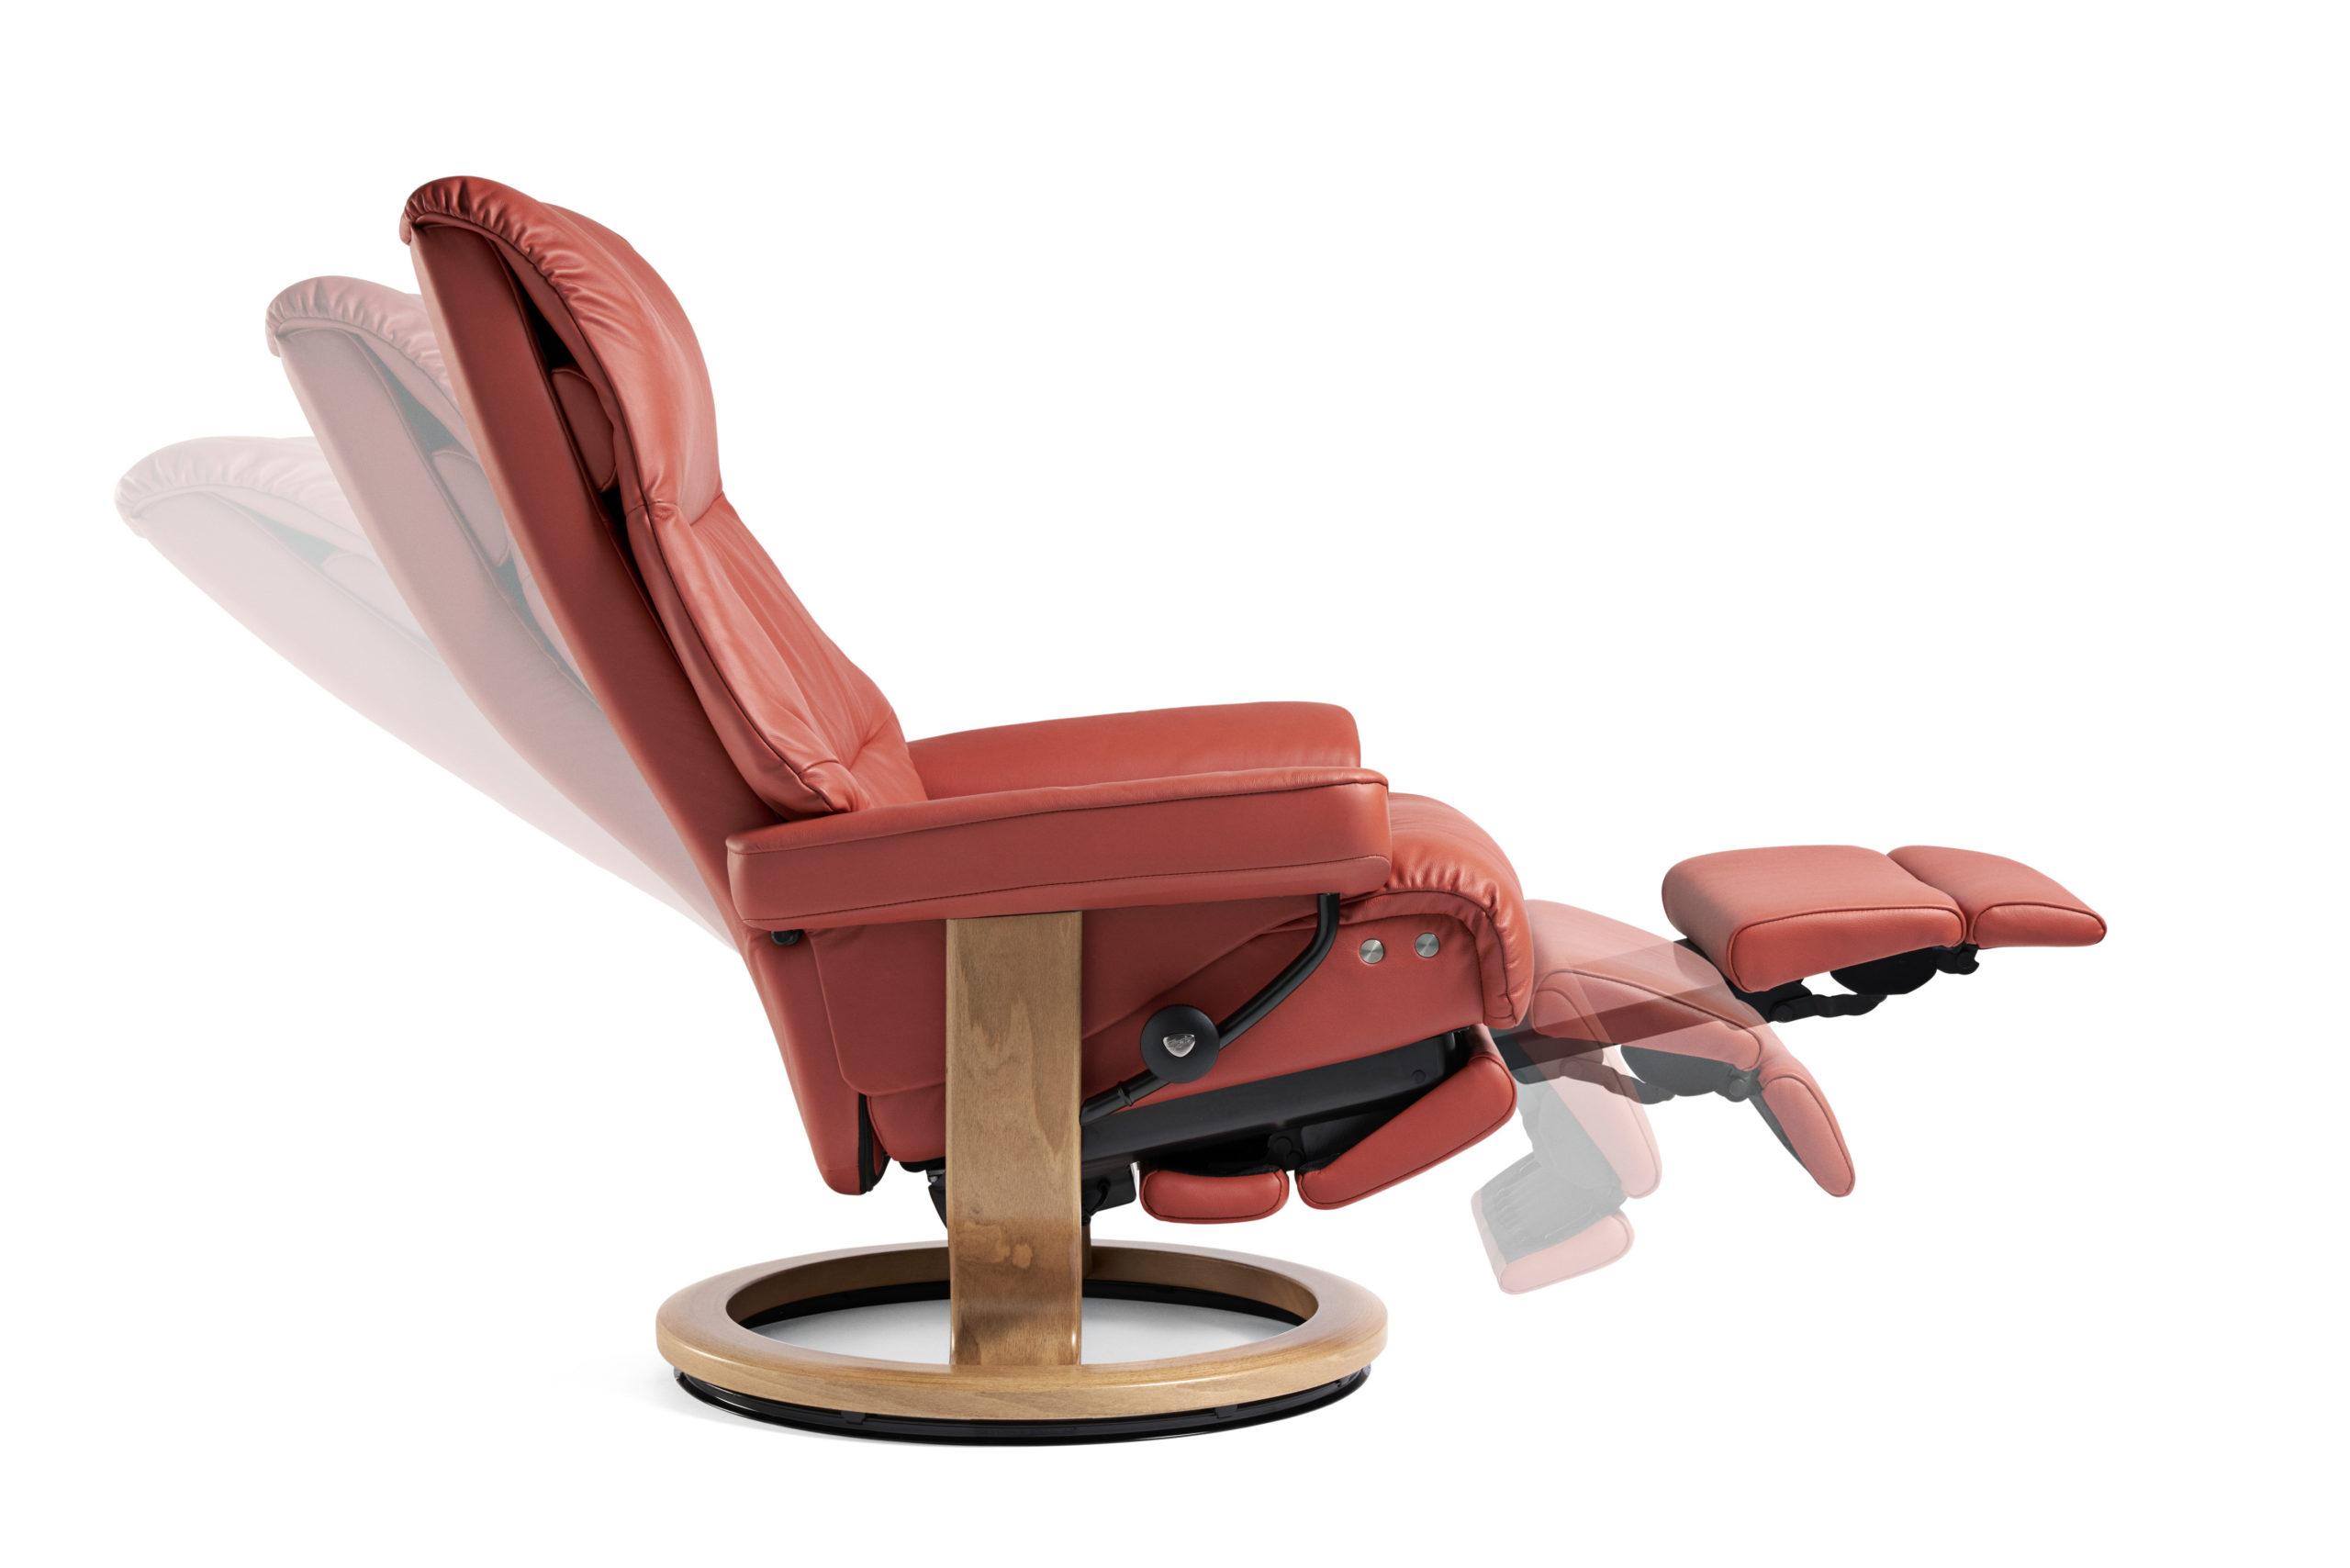 Stressless Recliner at Mums Furniture in Carmel CA